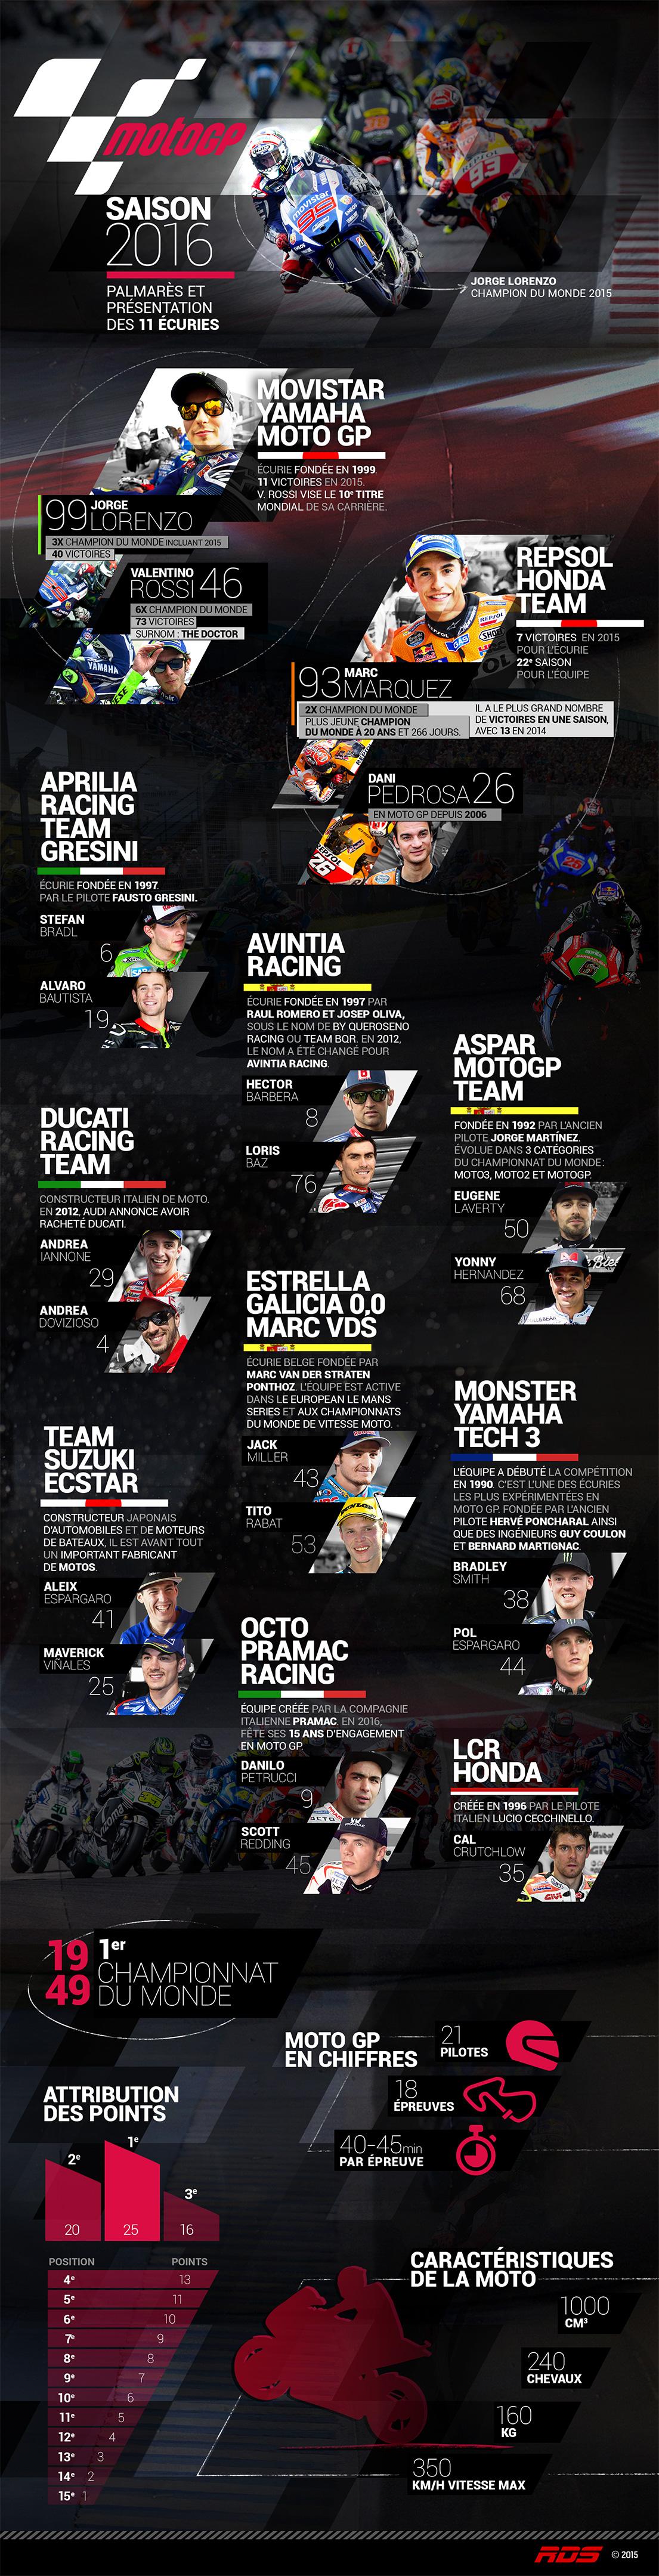 Saison 2016 Moto GP